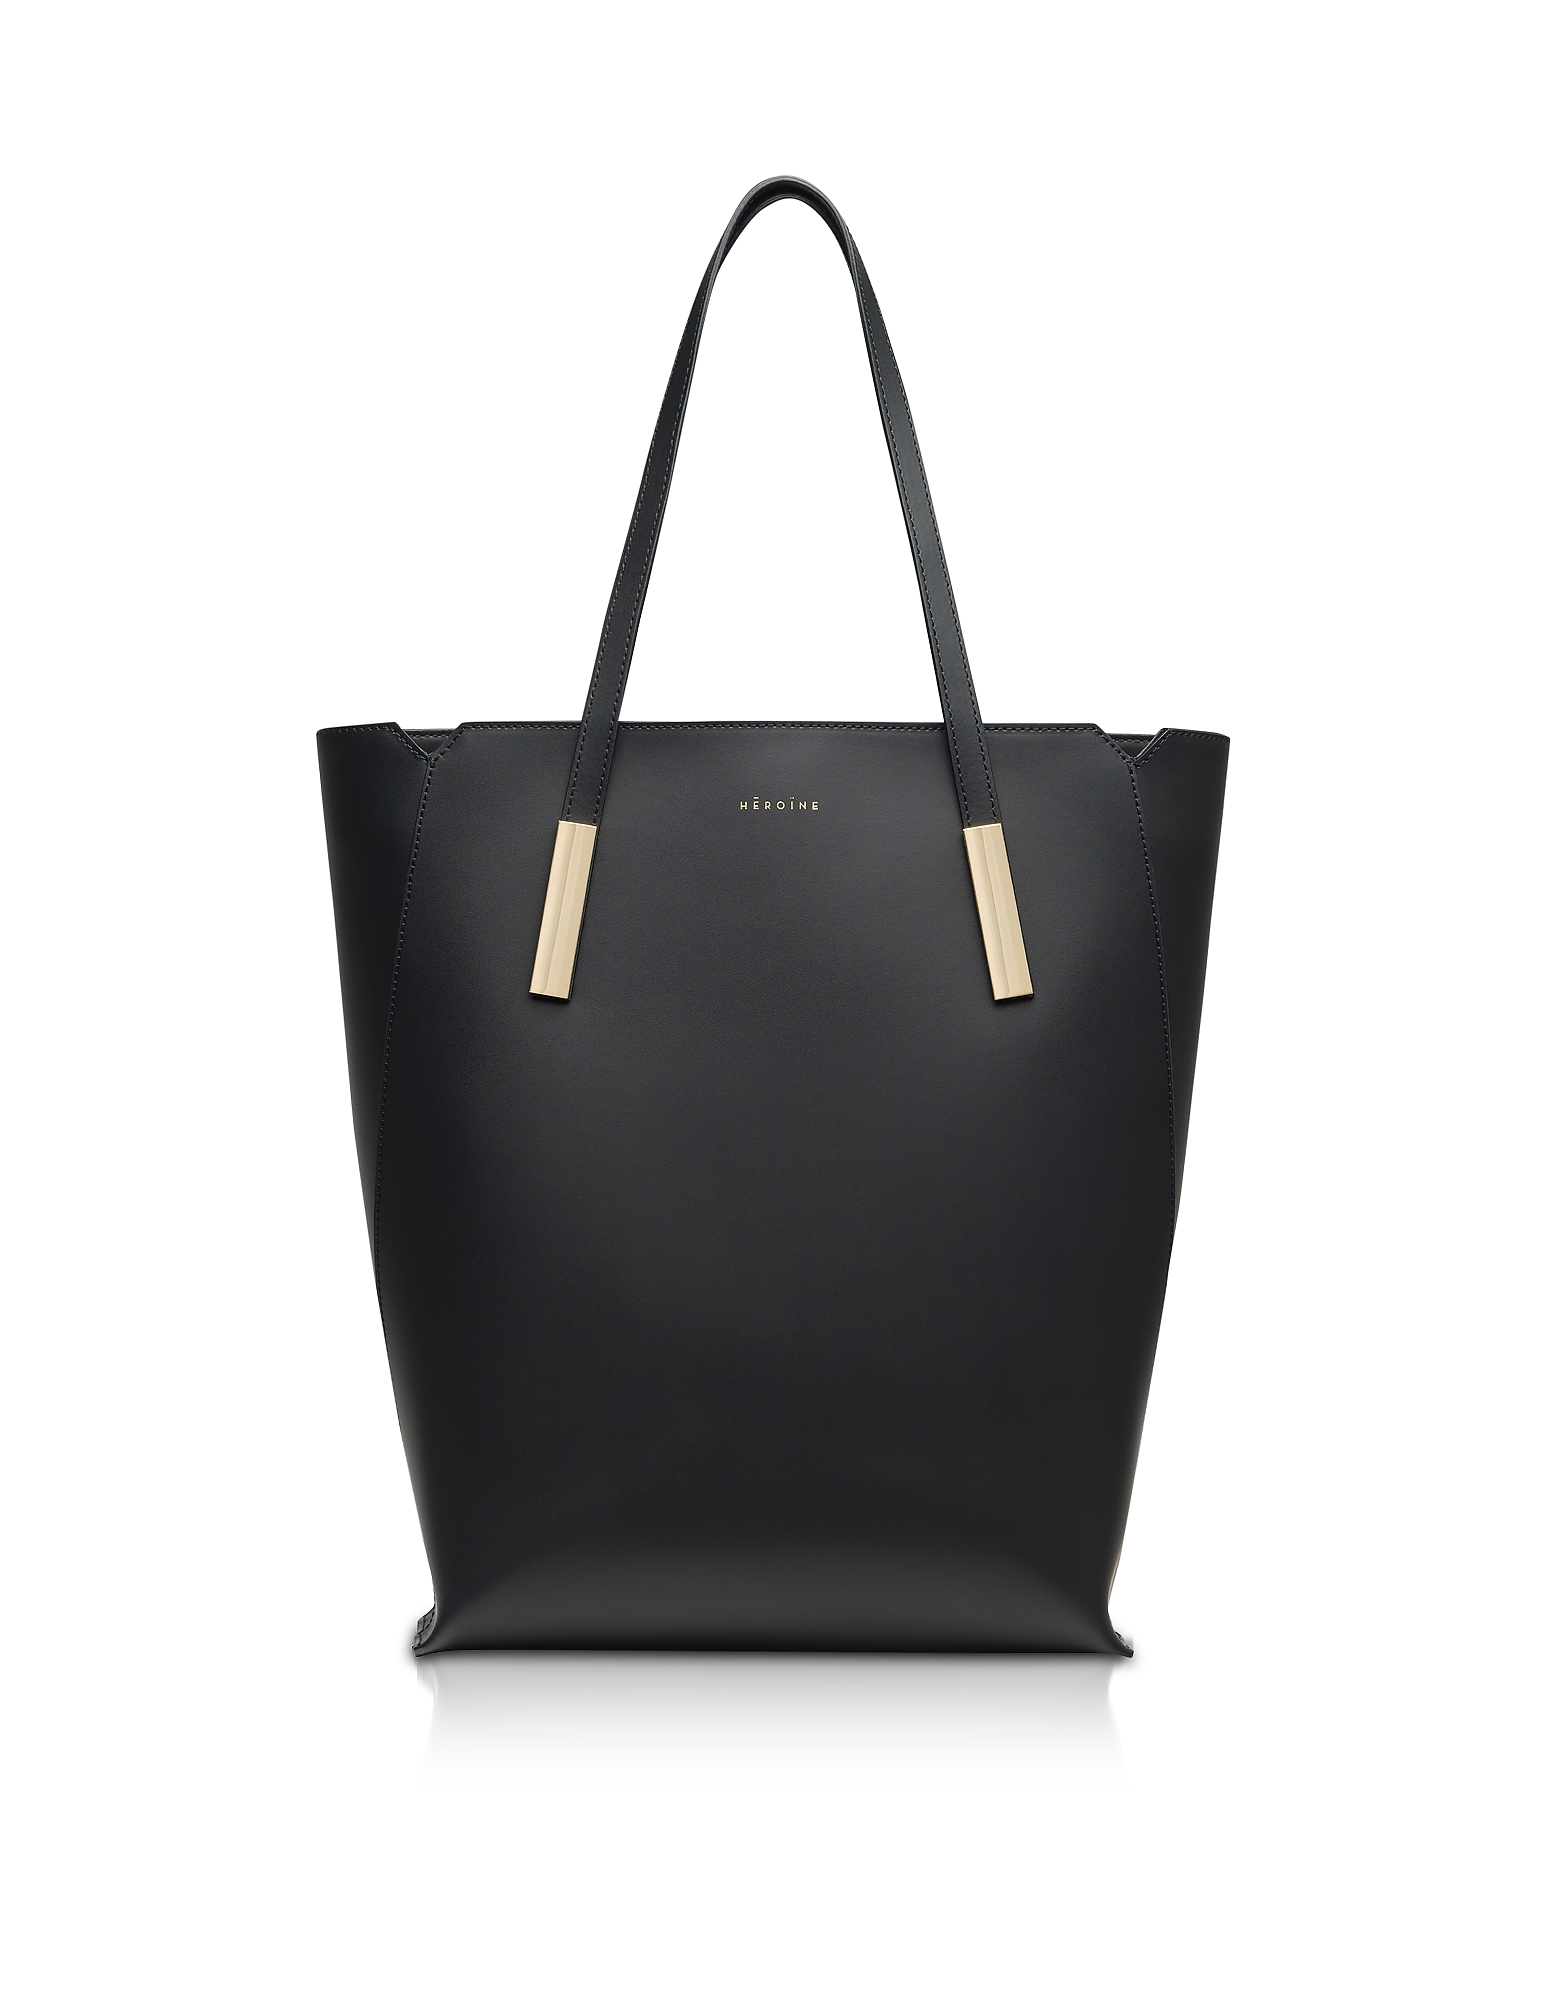 Maison Heroine Designer Handbags, Black Marta Leather Tote Bag